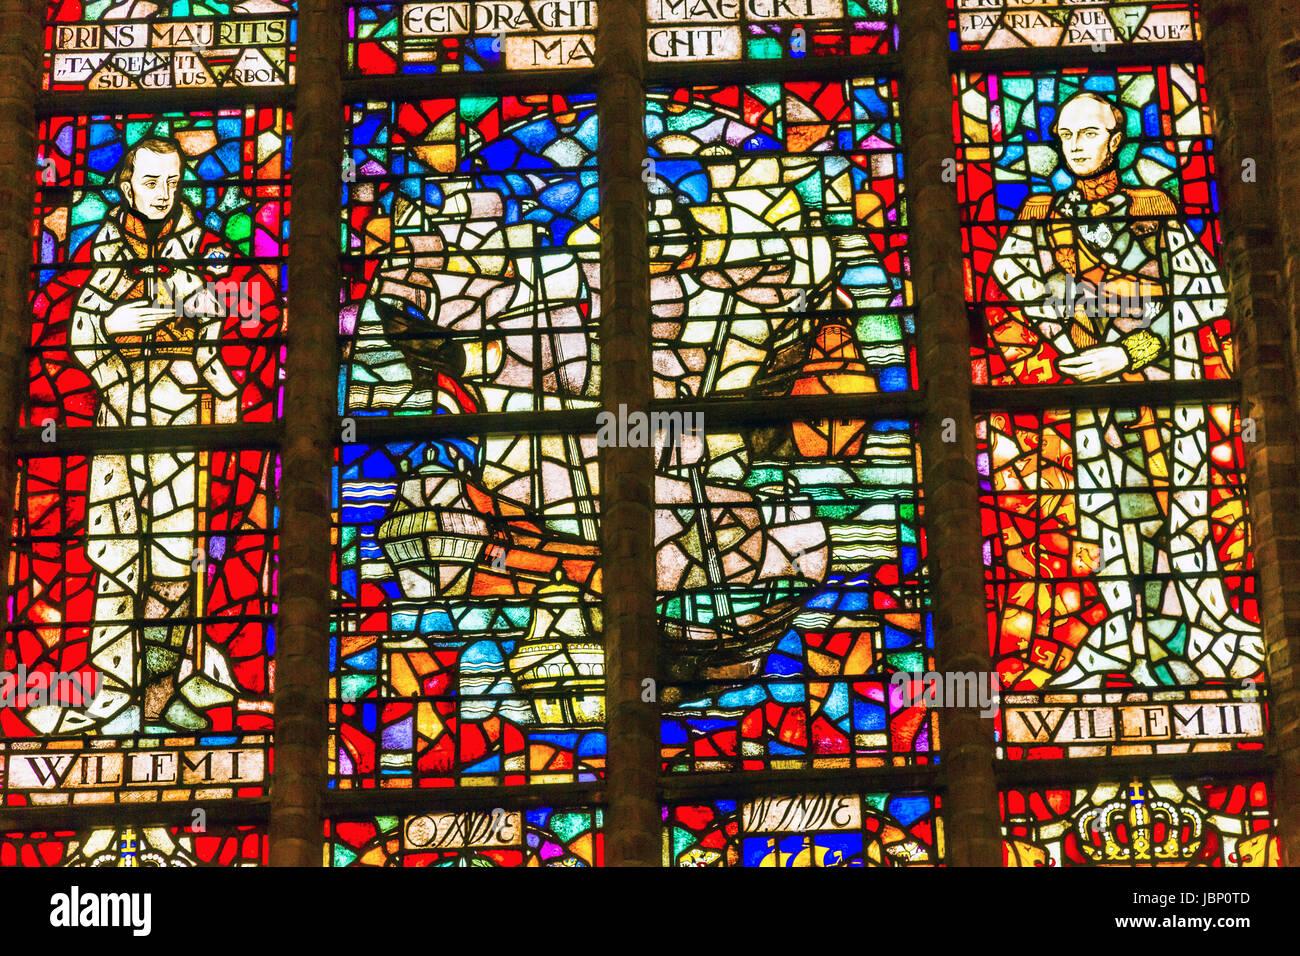 Rey Williem I y Willem II Holanda Vidrieras Catedral Nueva Nieuwe Kerk, Iglesia Reformada Holandesa Delft Holanda Imagen De Stock